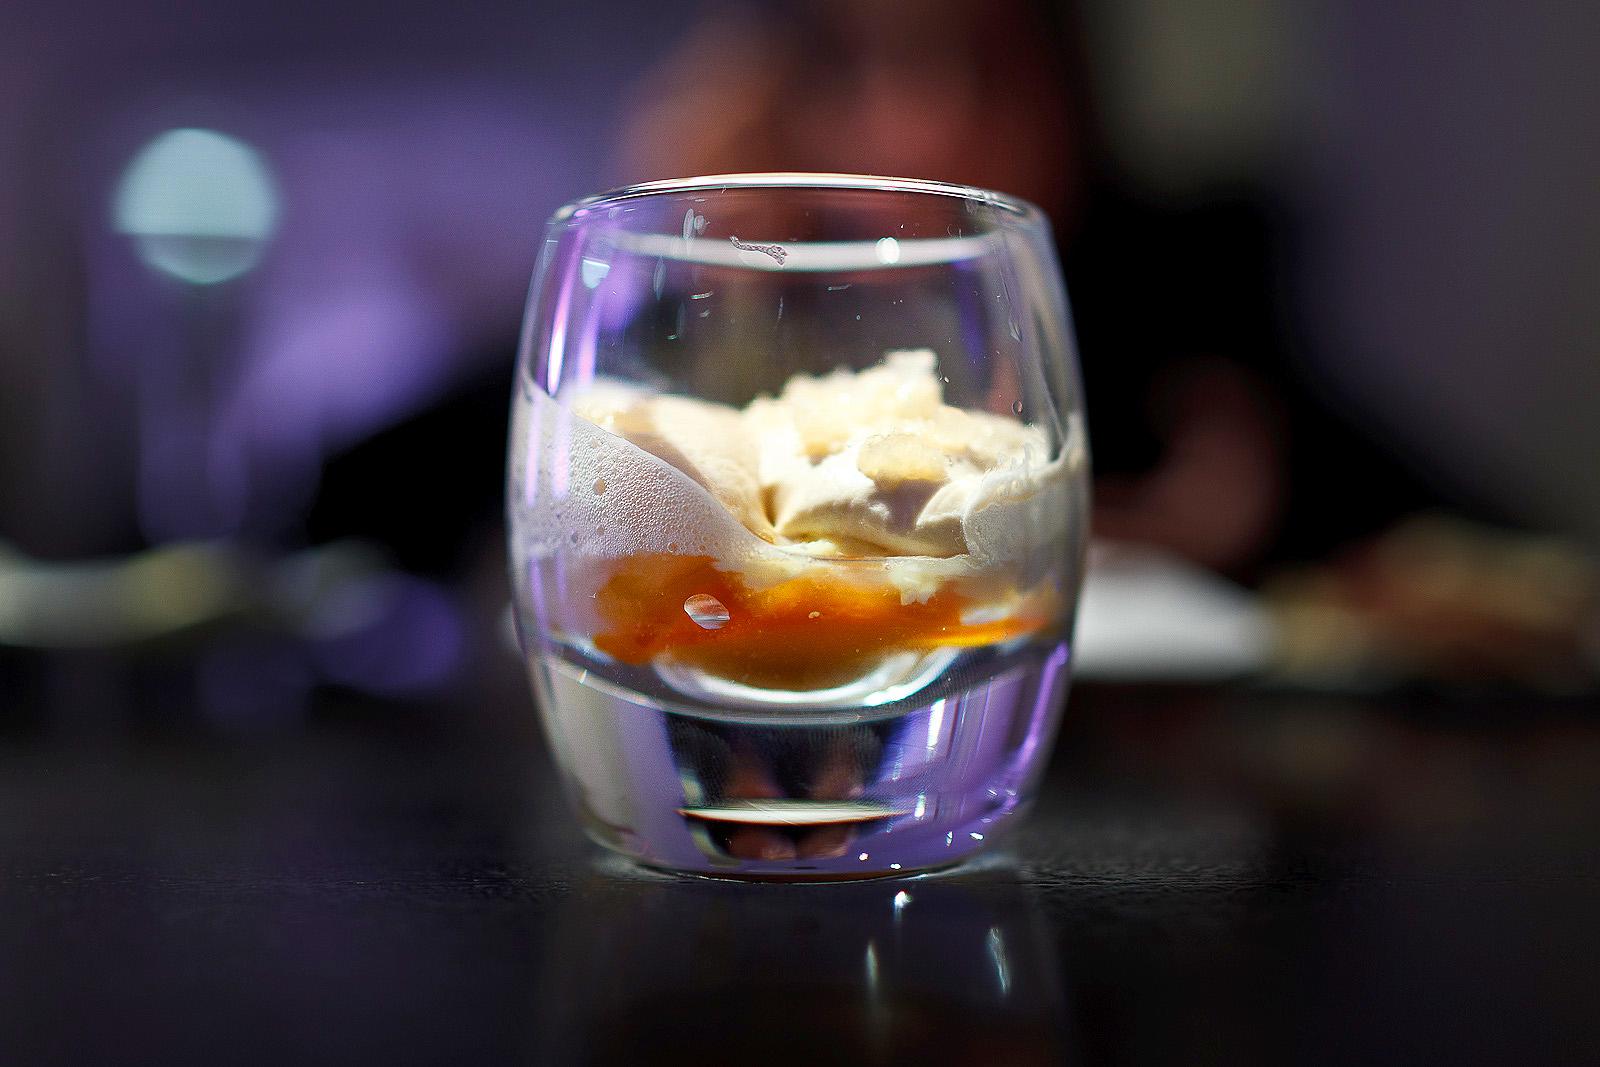 Alinea, Chicago - Blue crab, carrot, five spice, duck